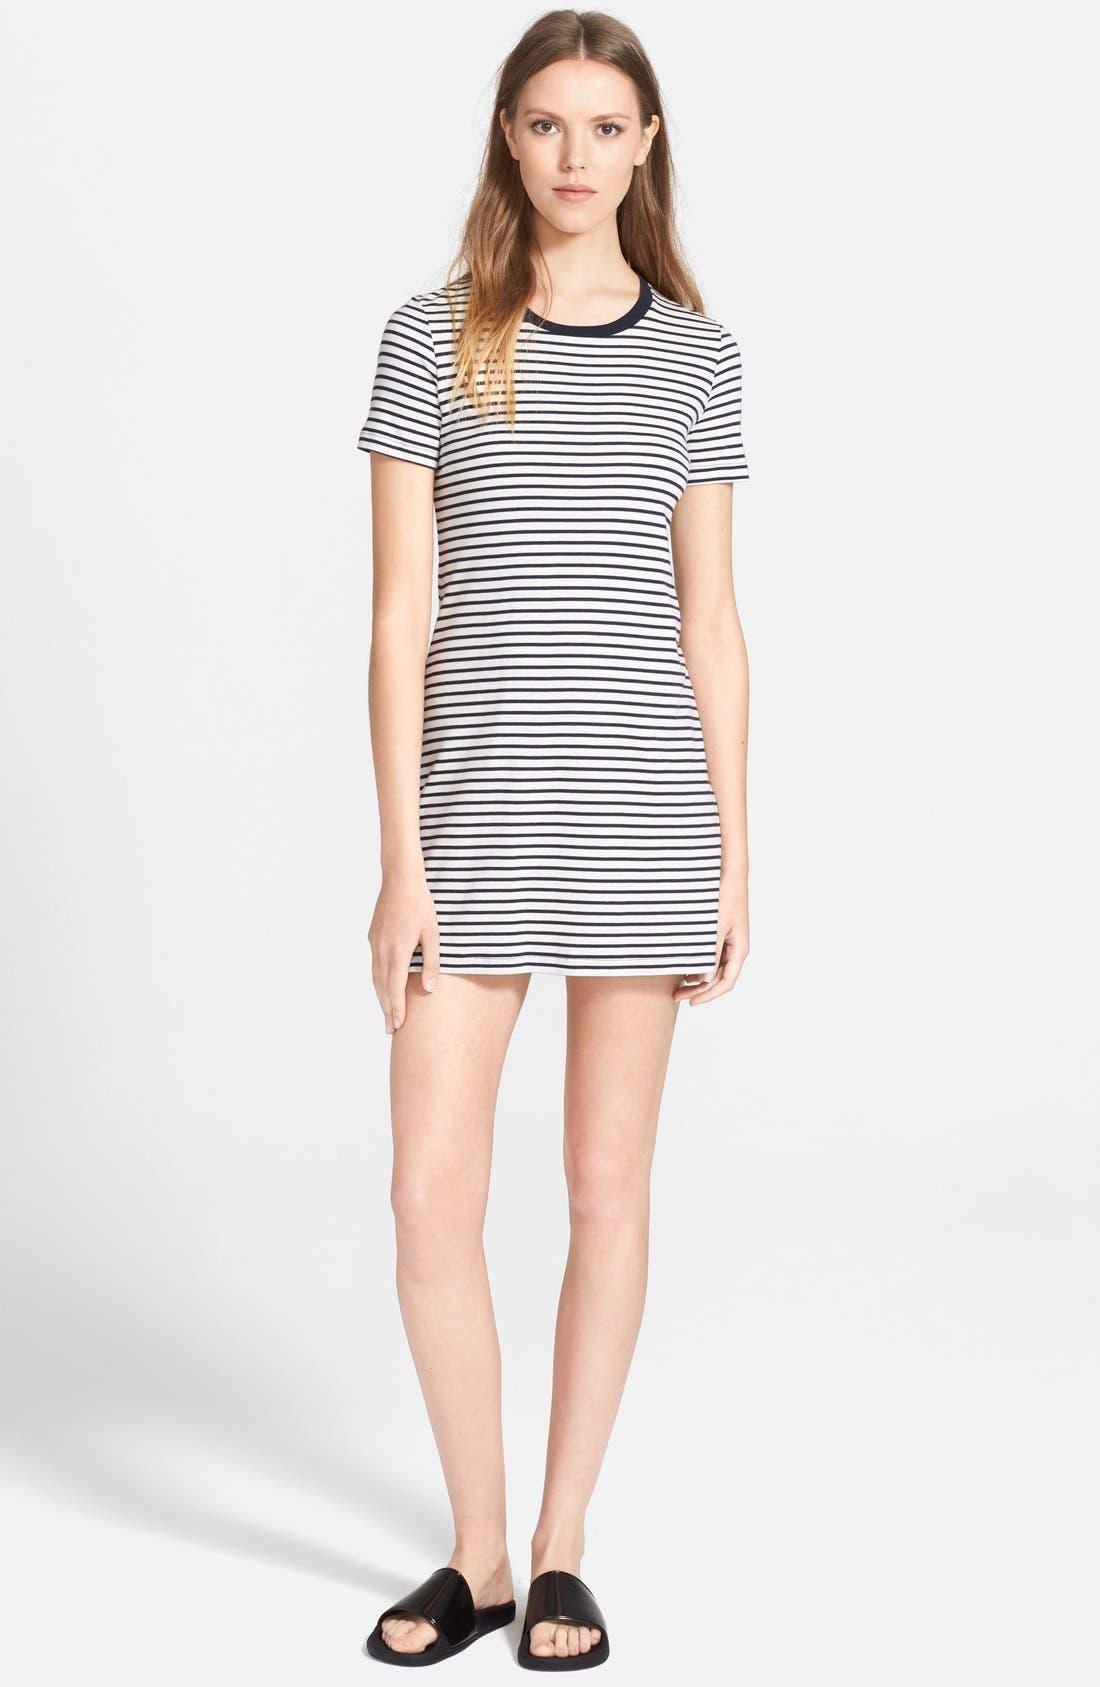 Alternate Image 1 Selected - Theory 'Cherry' Stripe Pima Cotton T-Shirt Dress